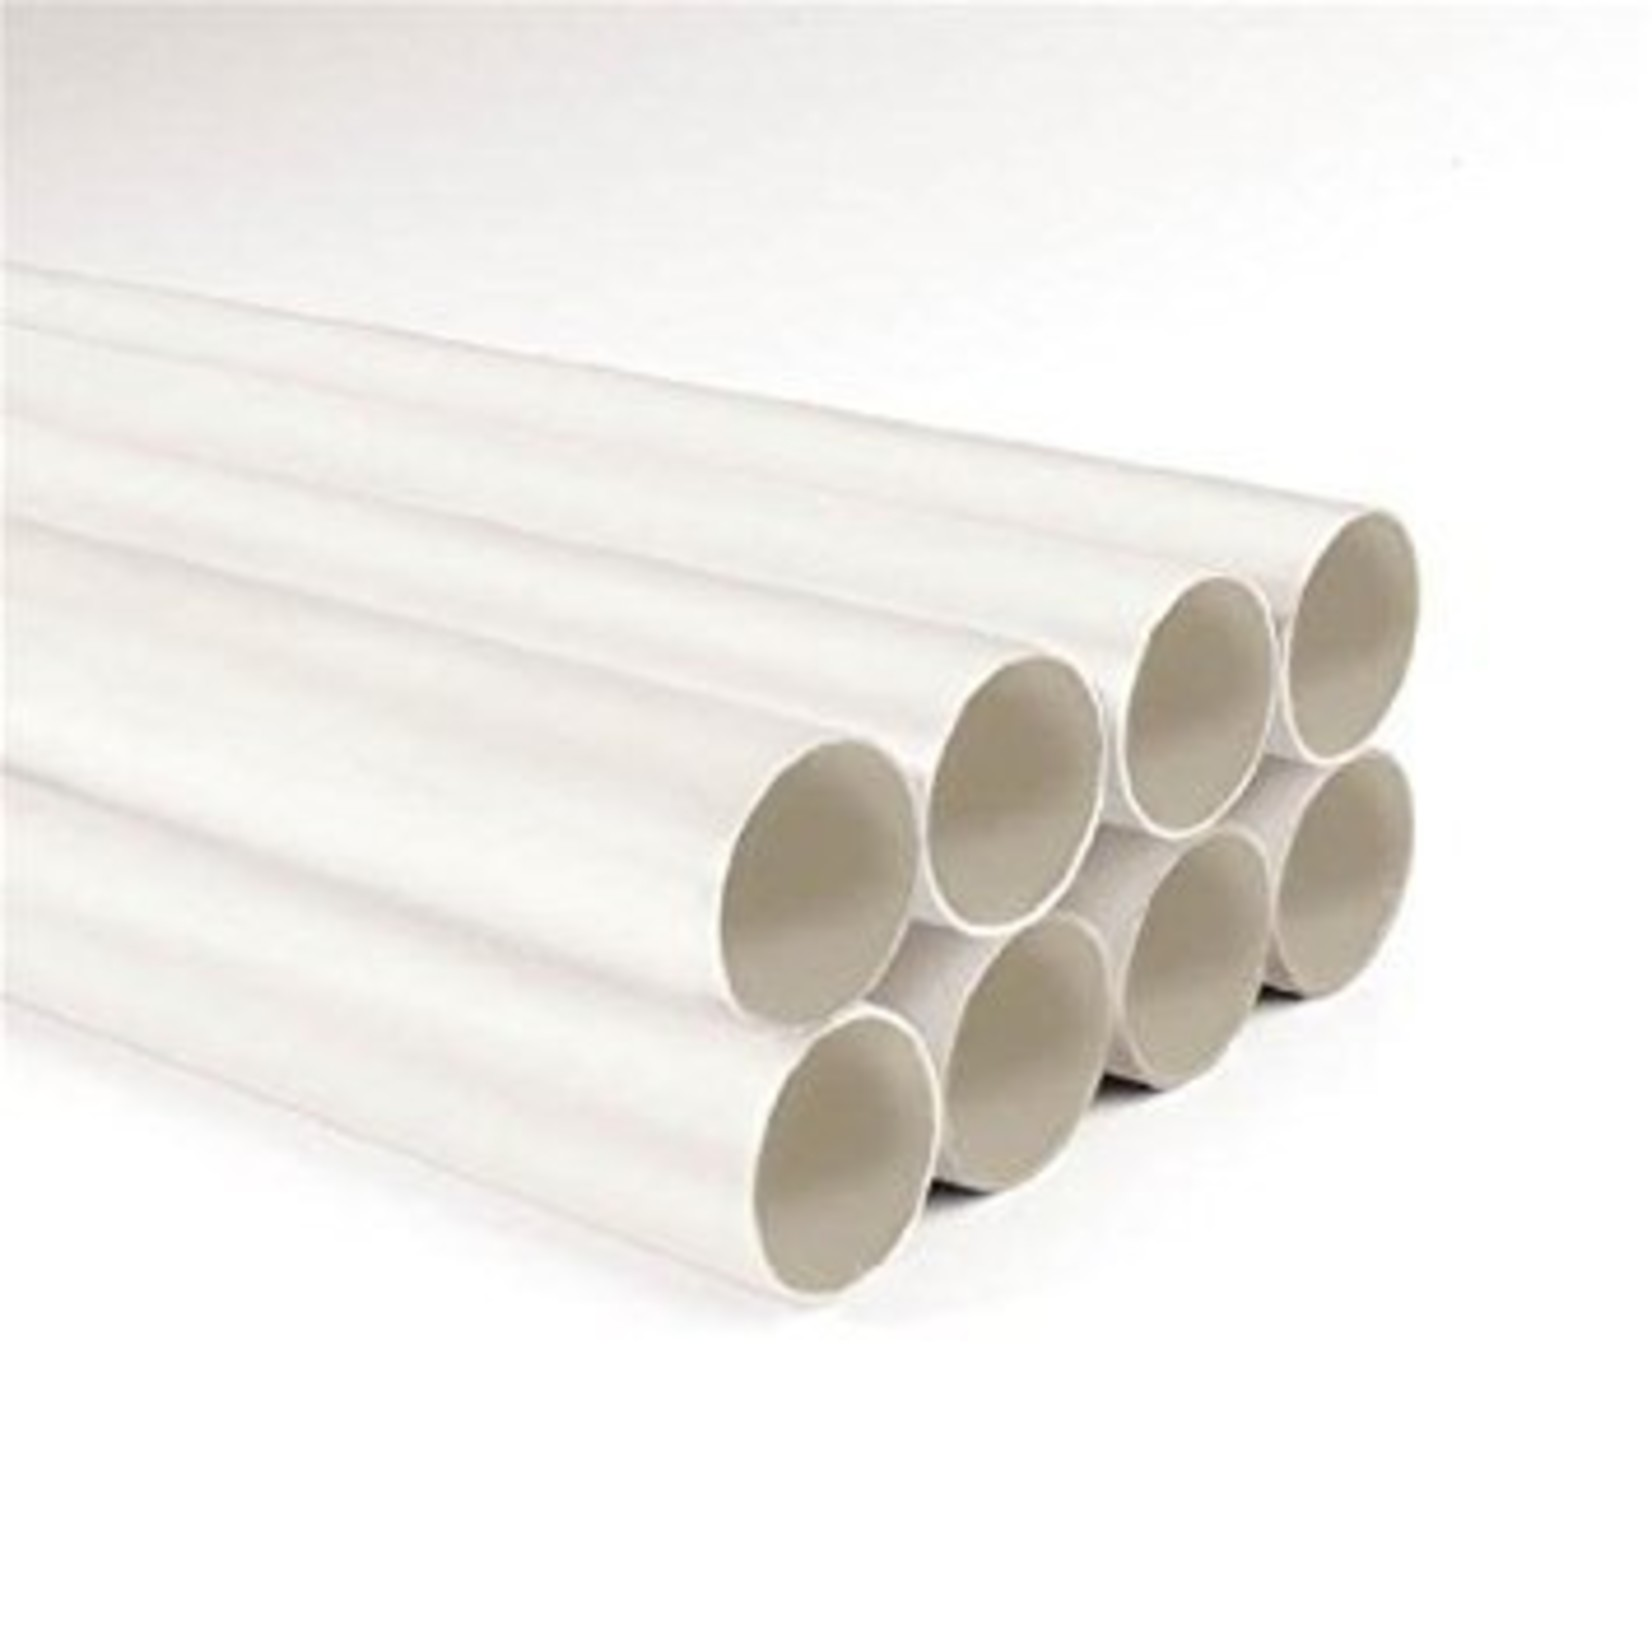 BEAM CVS 5' Stick of Pipe (Single Stick)